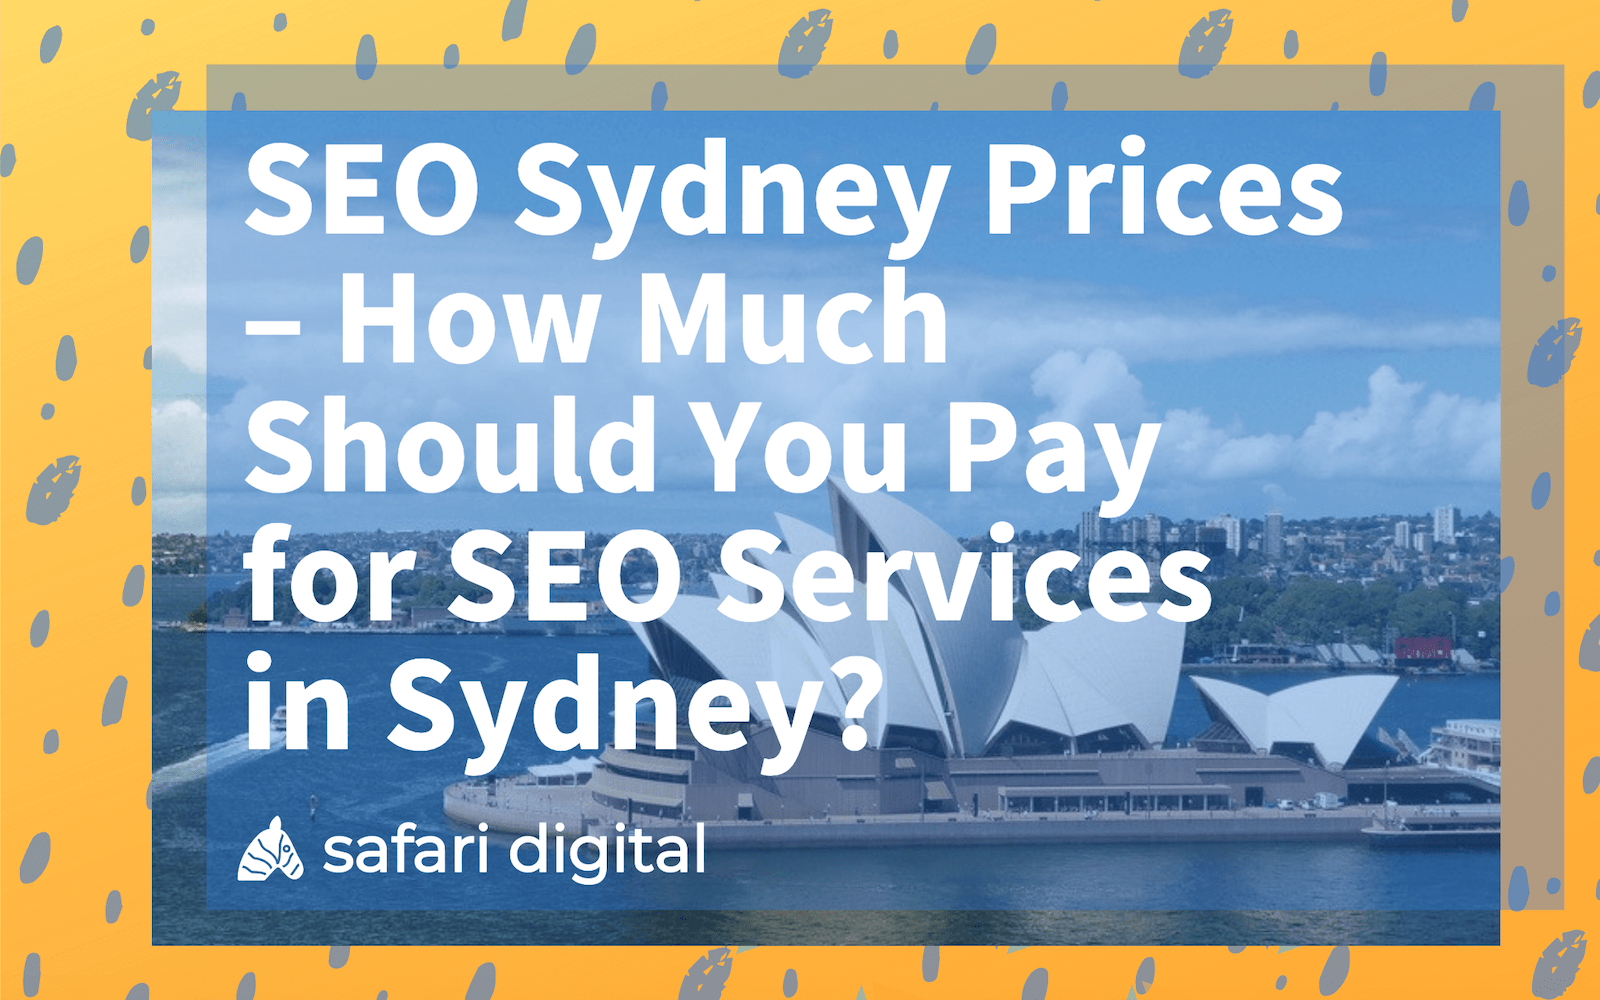 SEO sydney prices cover image